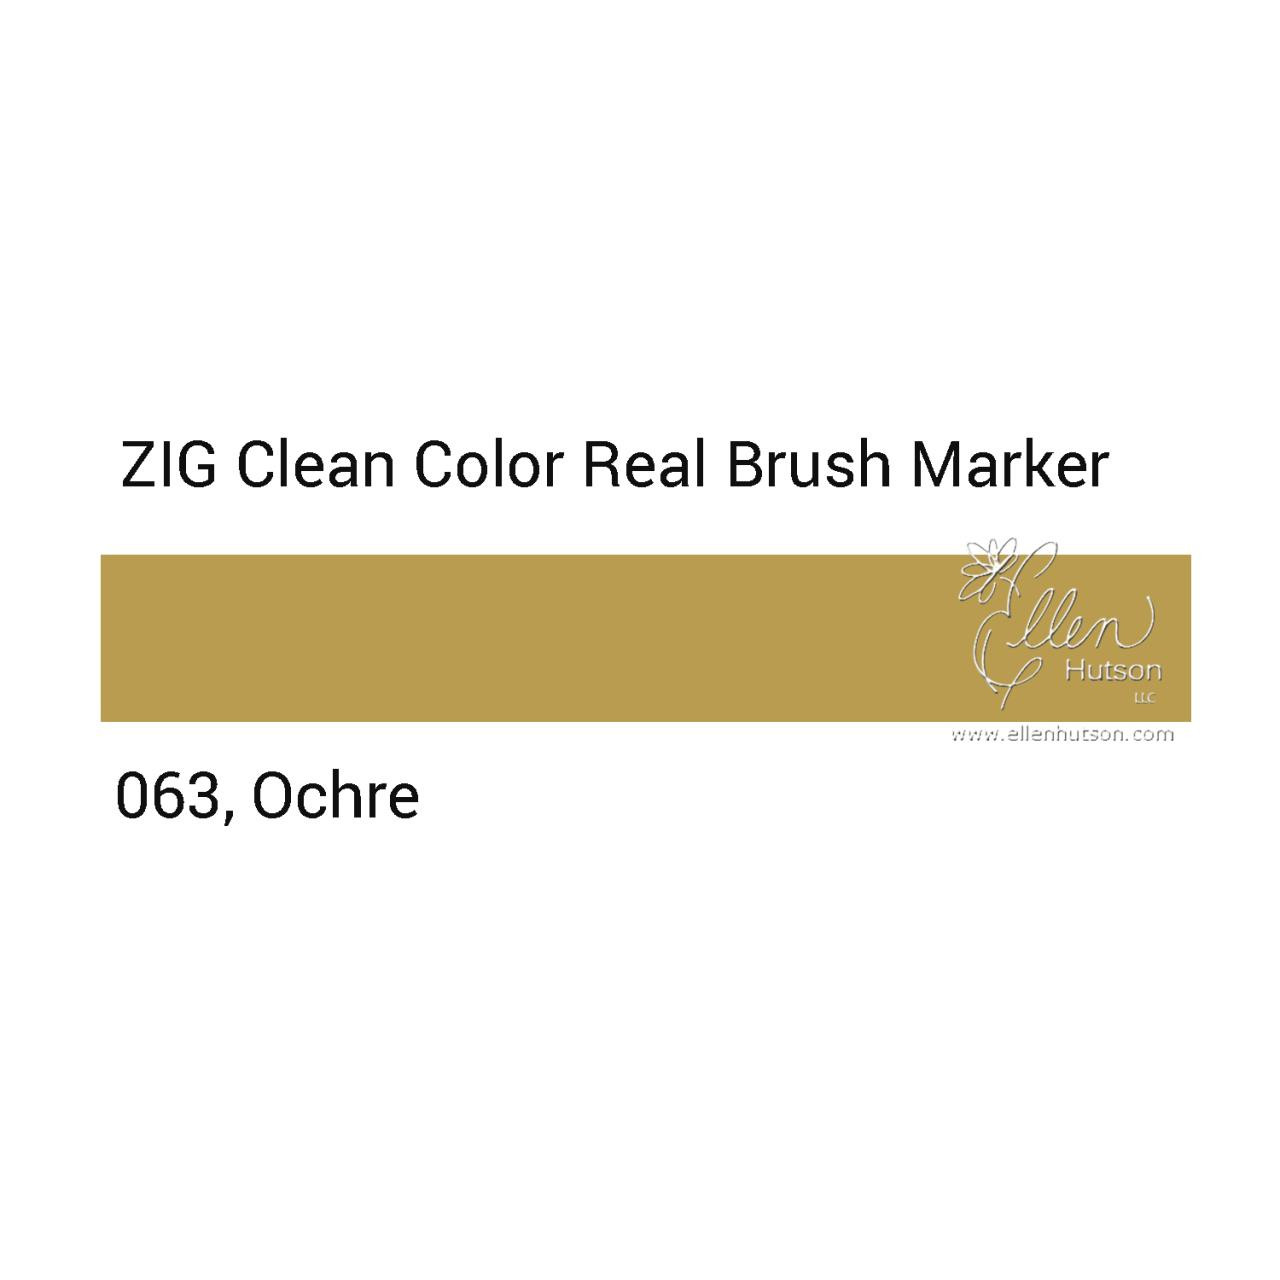 063 - Ochre, ZIG Clean Color Real Brush Marker -